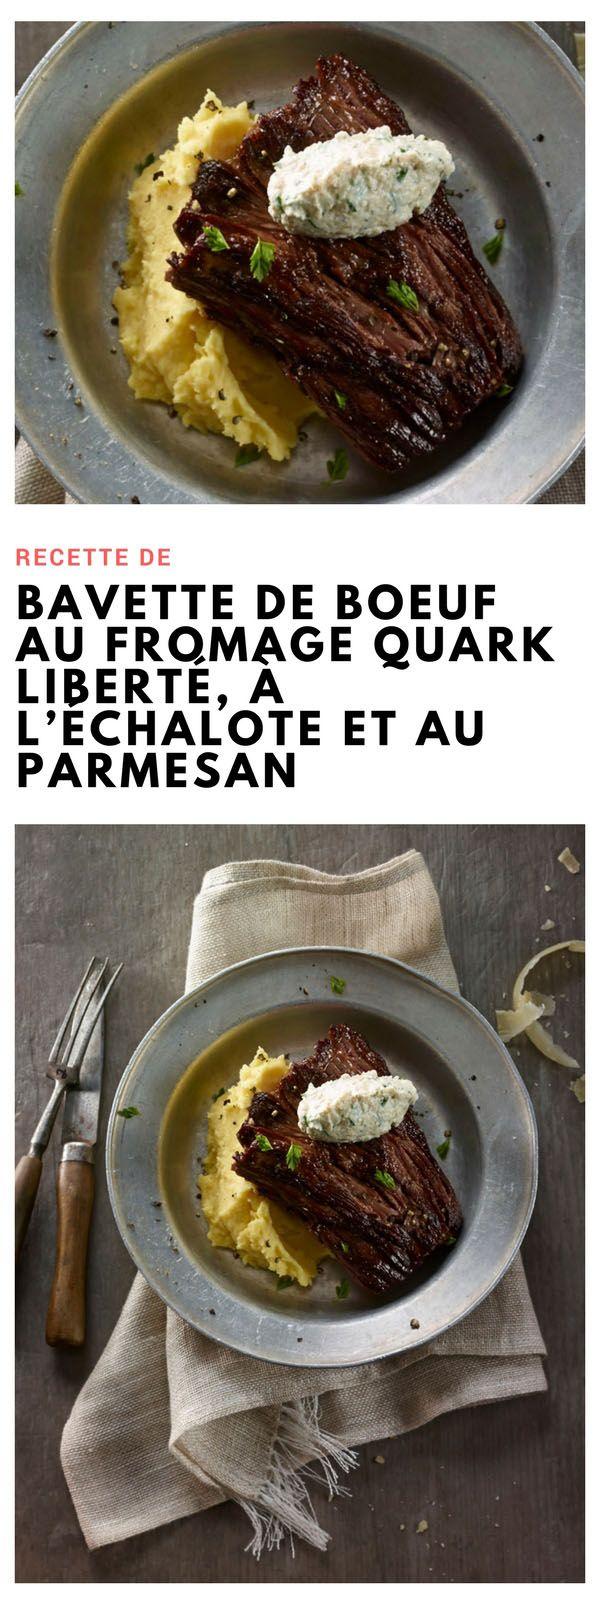 #bavette #boeuf #fromage #parmesan #échalote